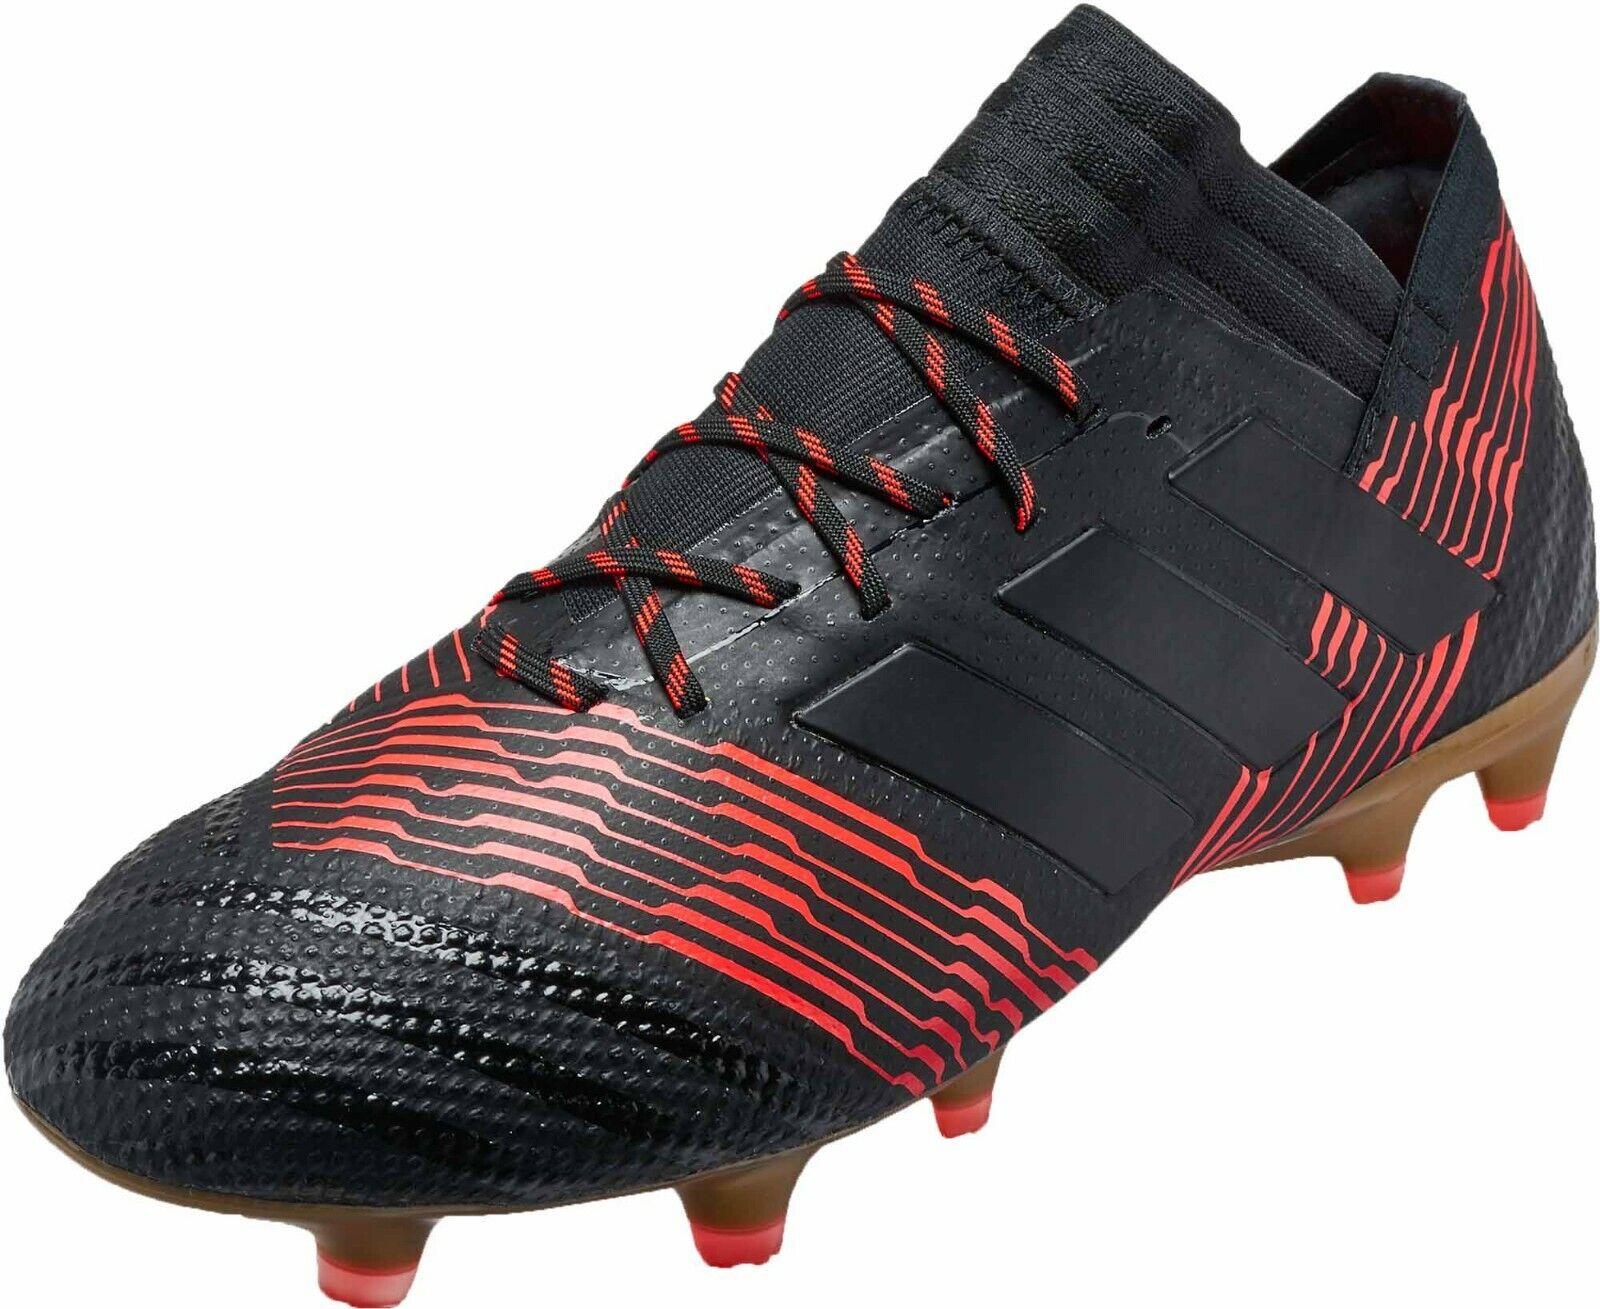 Adidas NEMEZIZ 17.1 FG Fußballschuhe Nocken CP8932 UK-10,5 EUR-45 1 3 schwarz